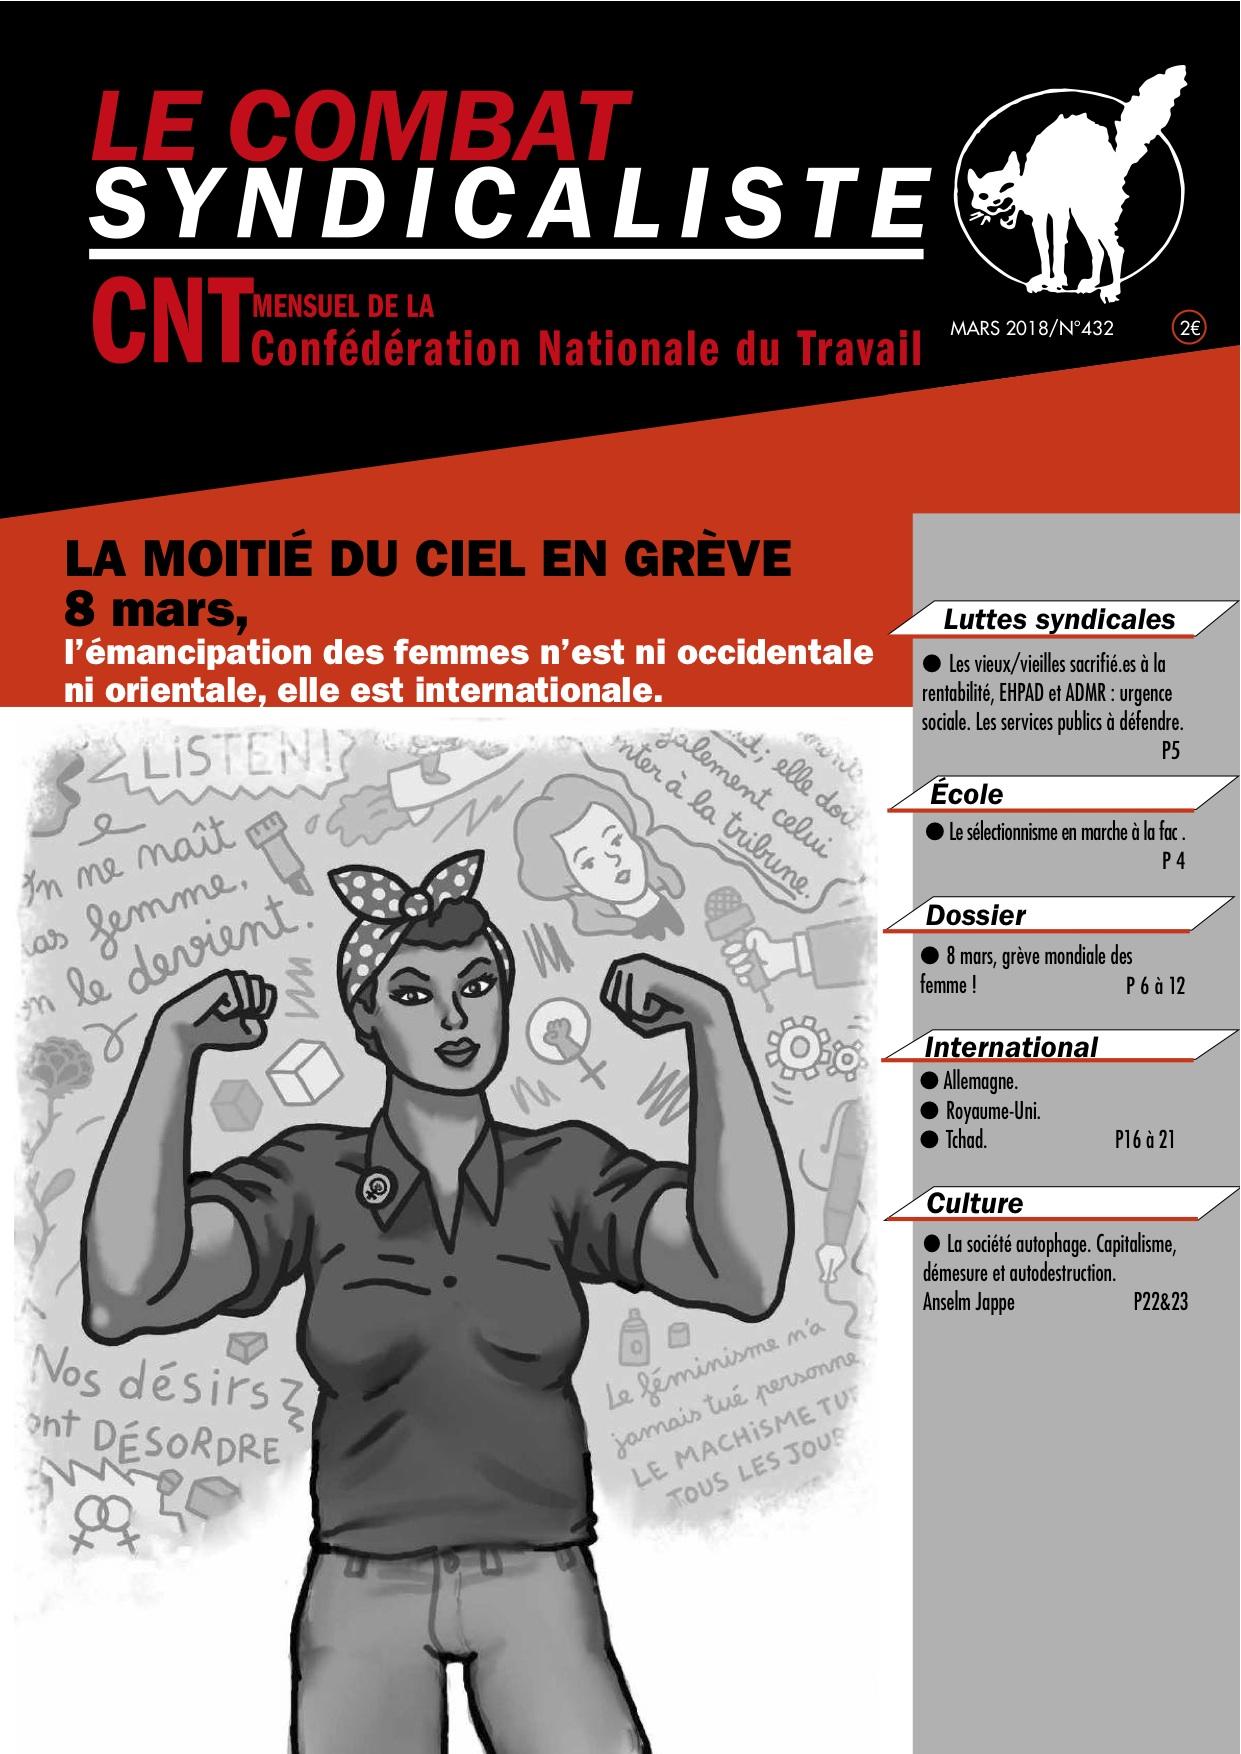 Combat Syndicaliste n°432 - Mars 2018